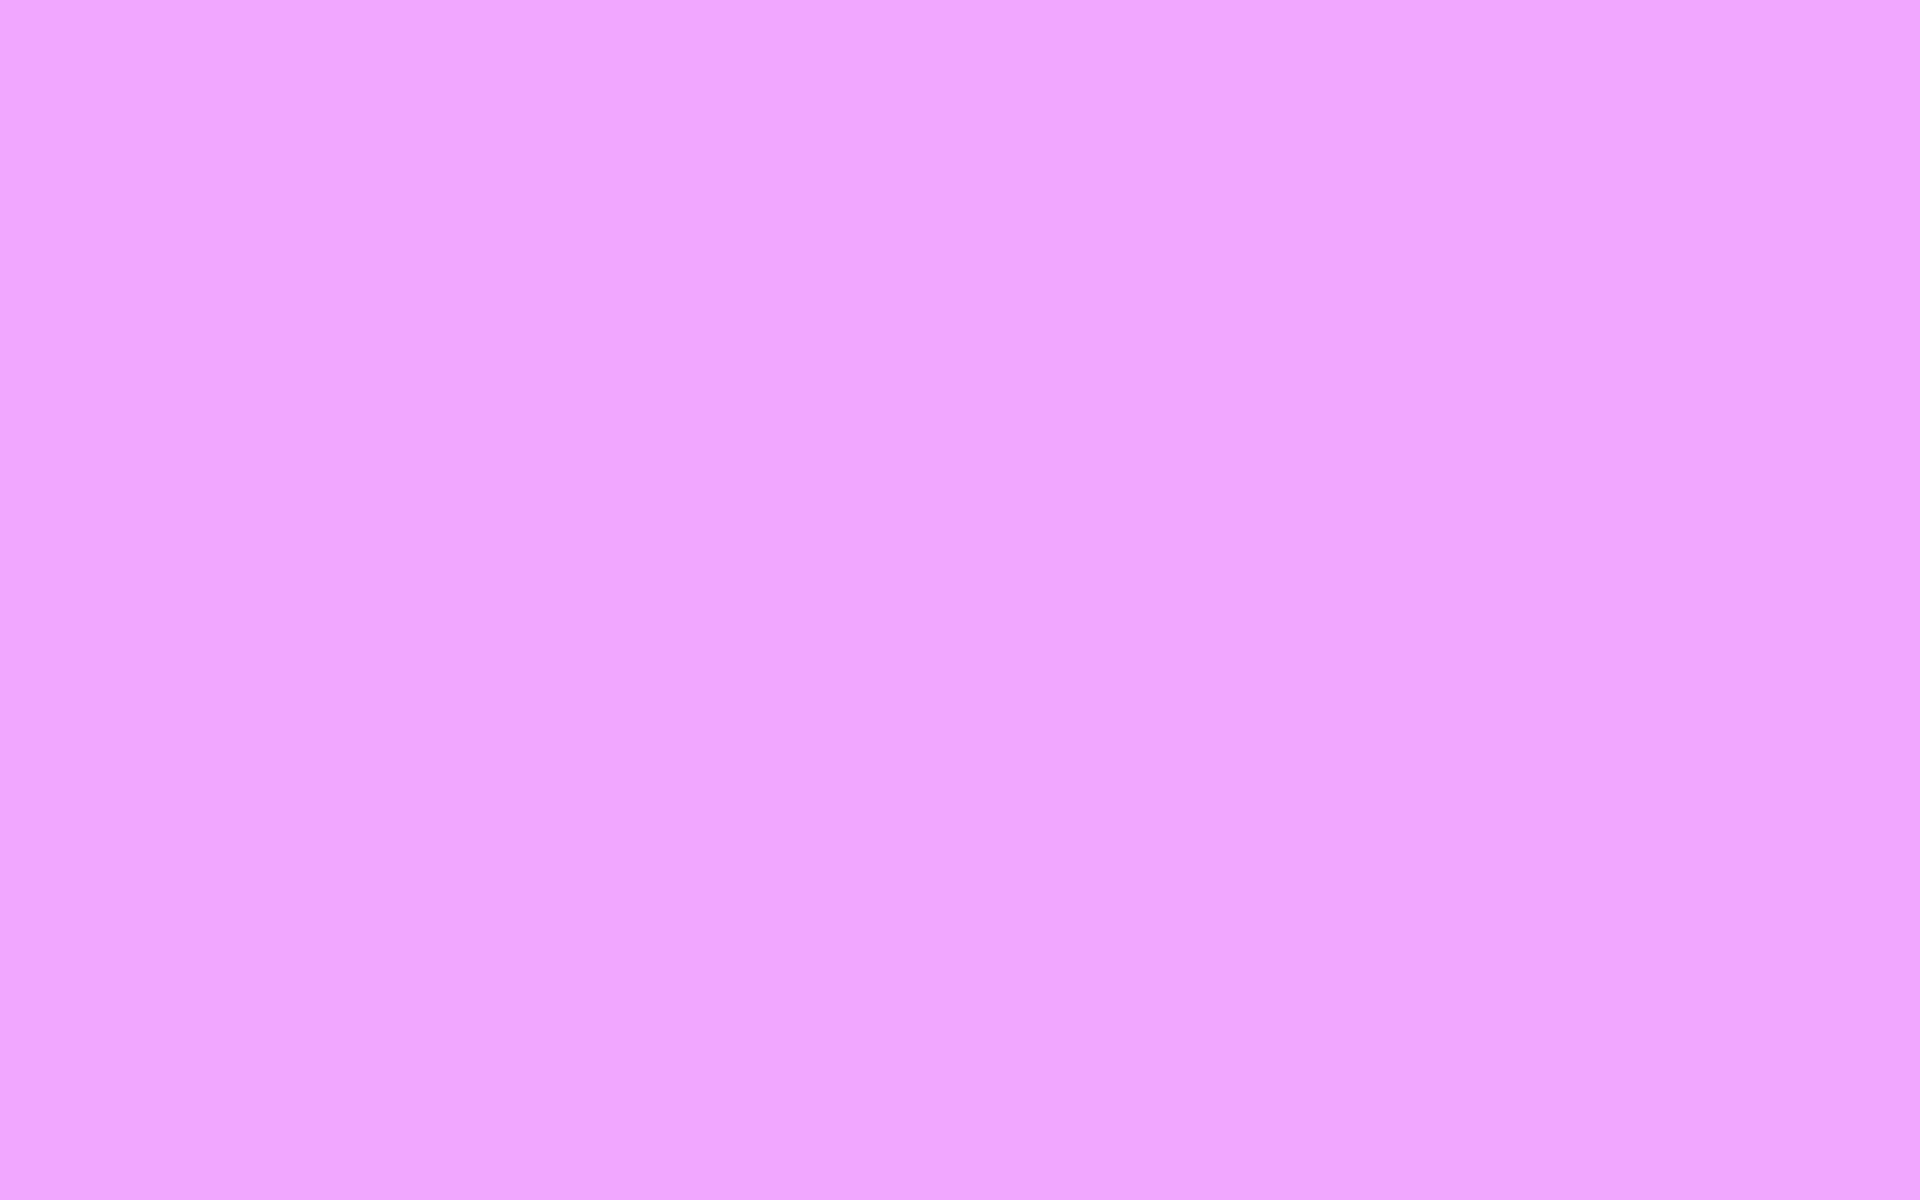 1920x1200 Rich Brilliant Lavender Solid Color Background